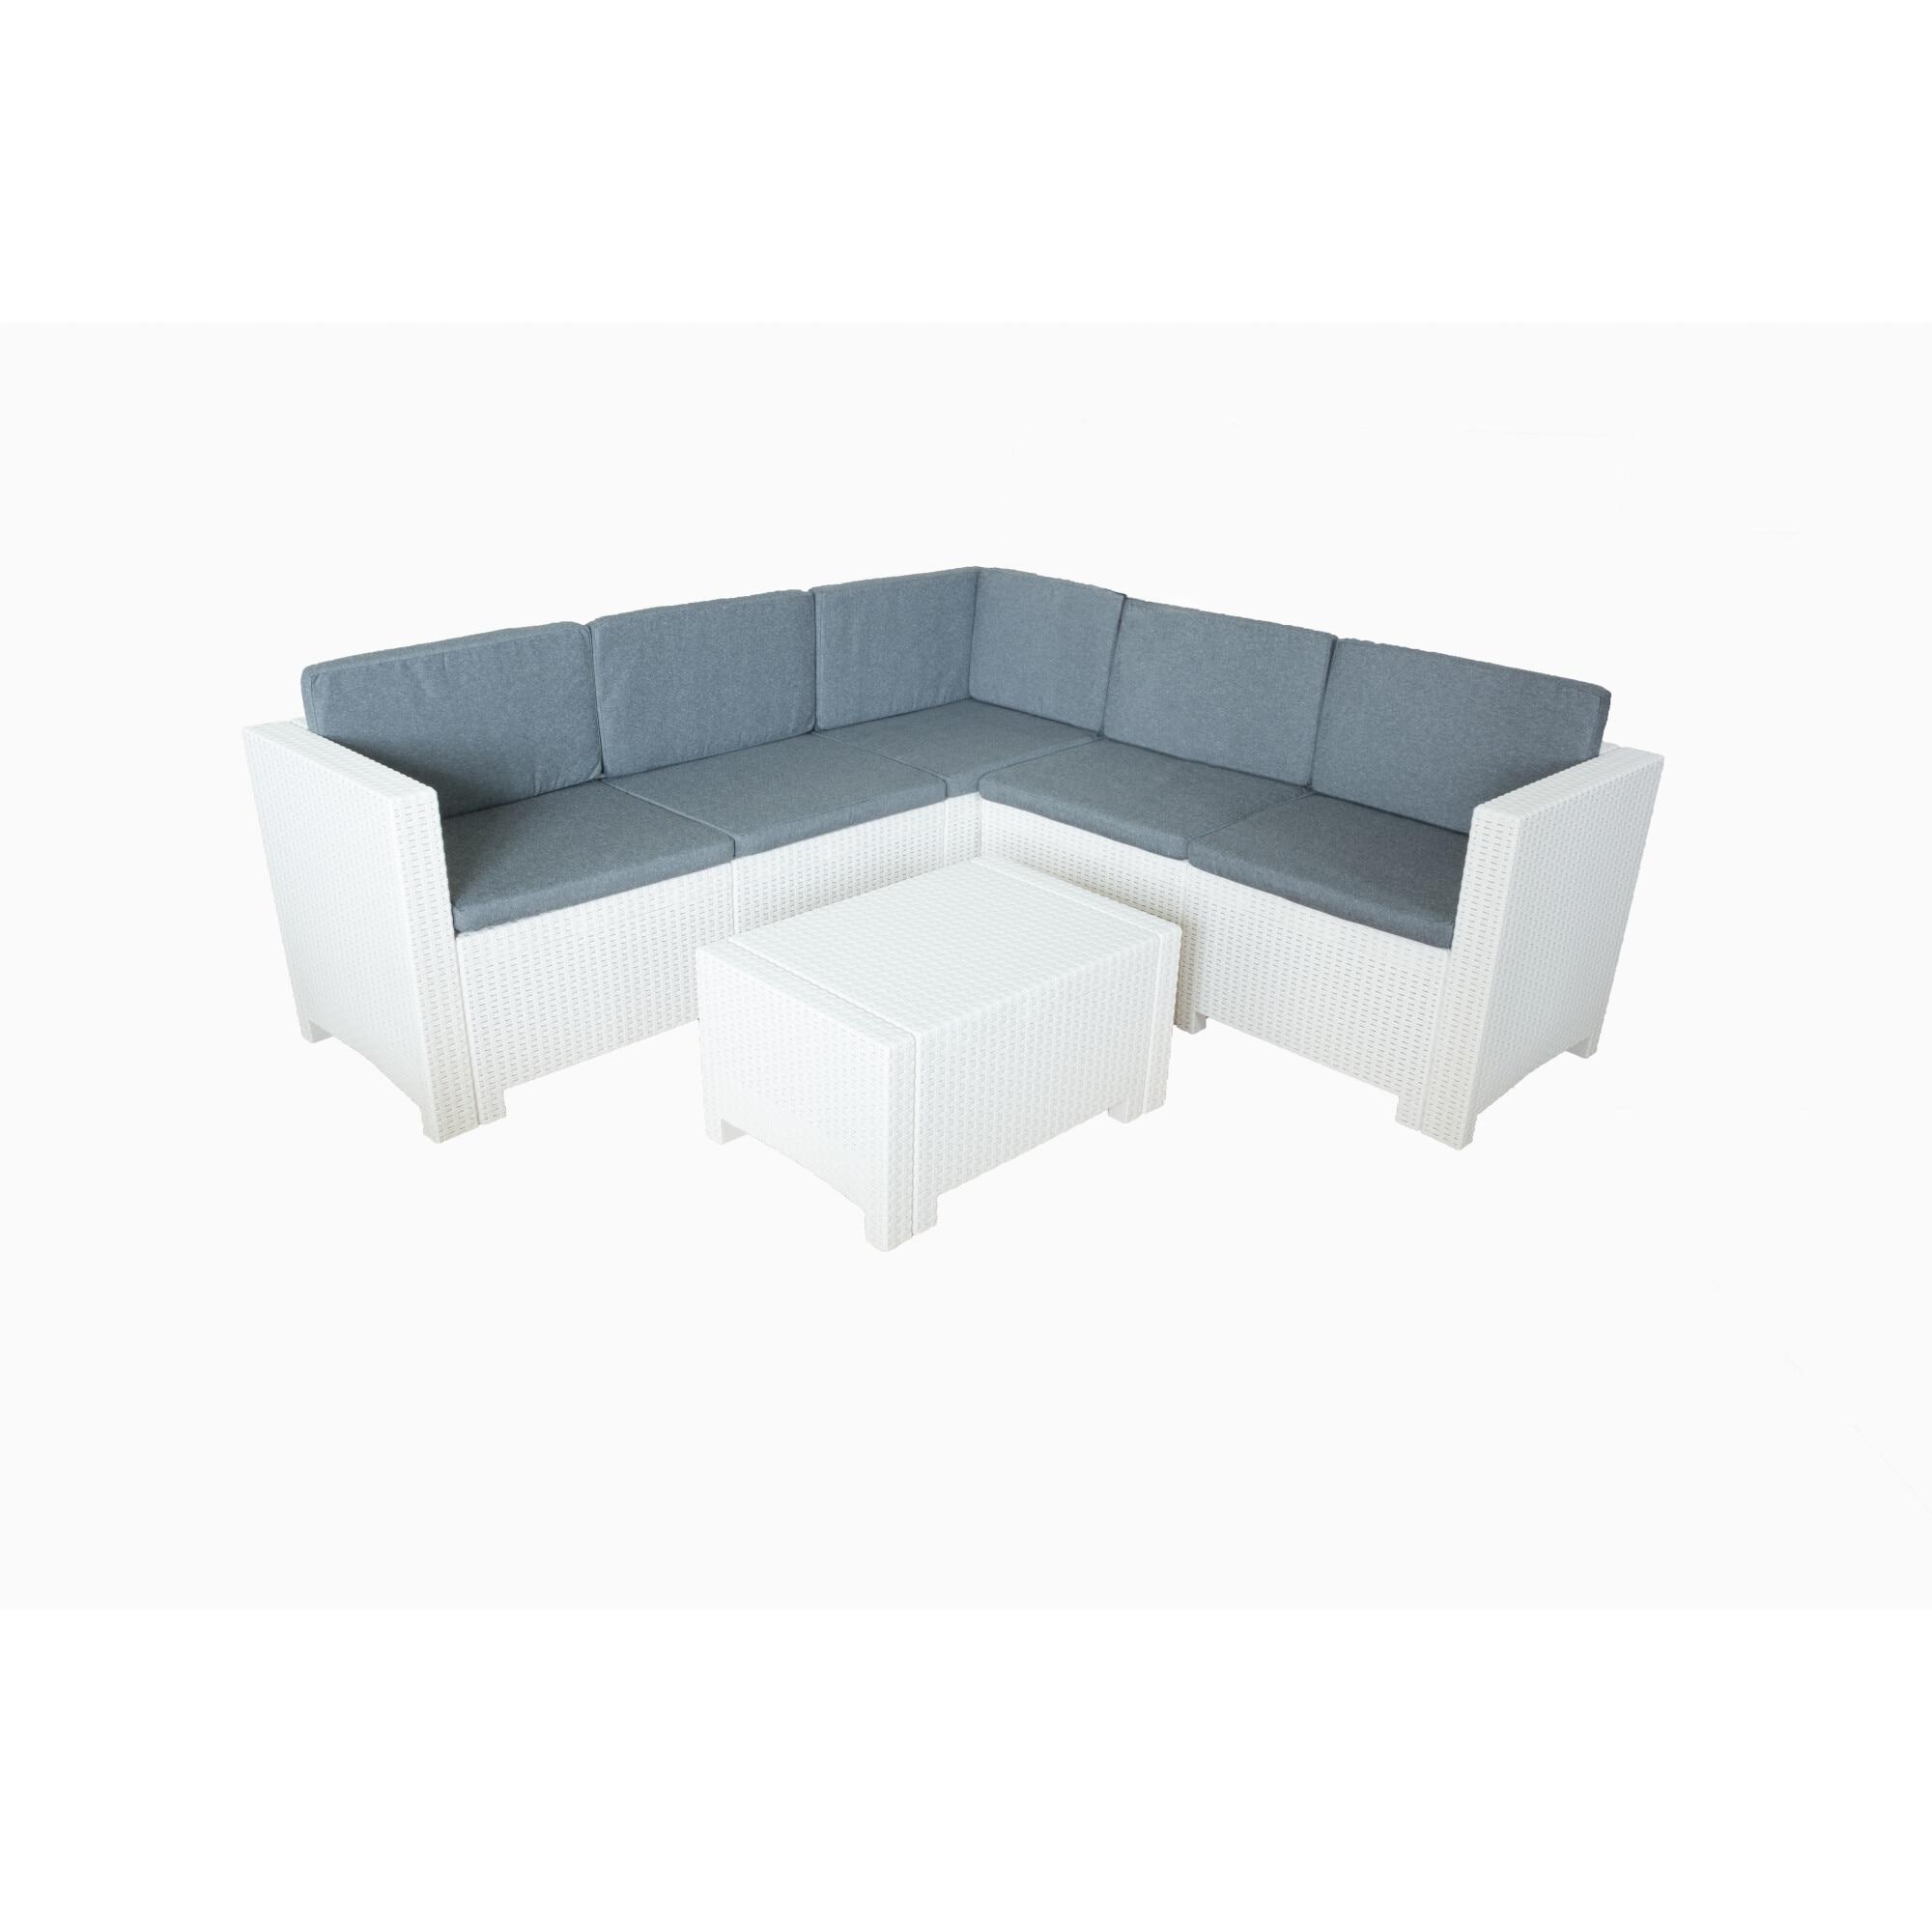 Fotografie Set mobilier gradina/terasa Colorado, coltar 5 locuri + masuta, perne incluse, alb